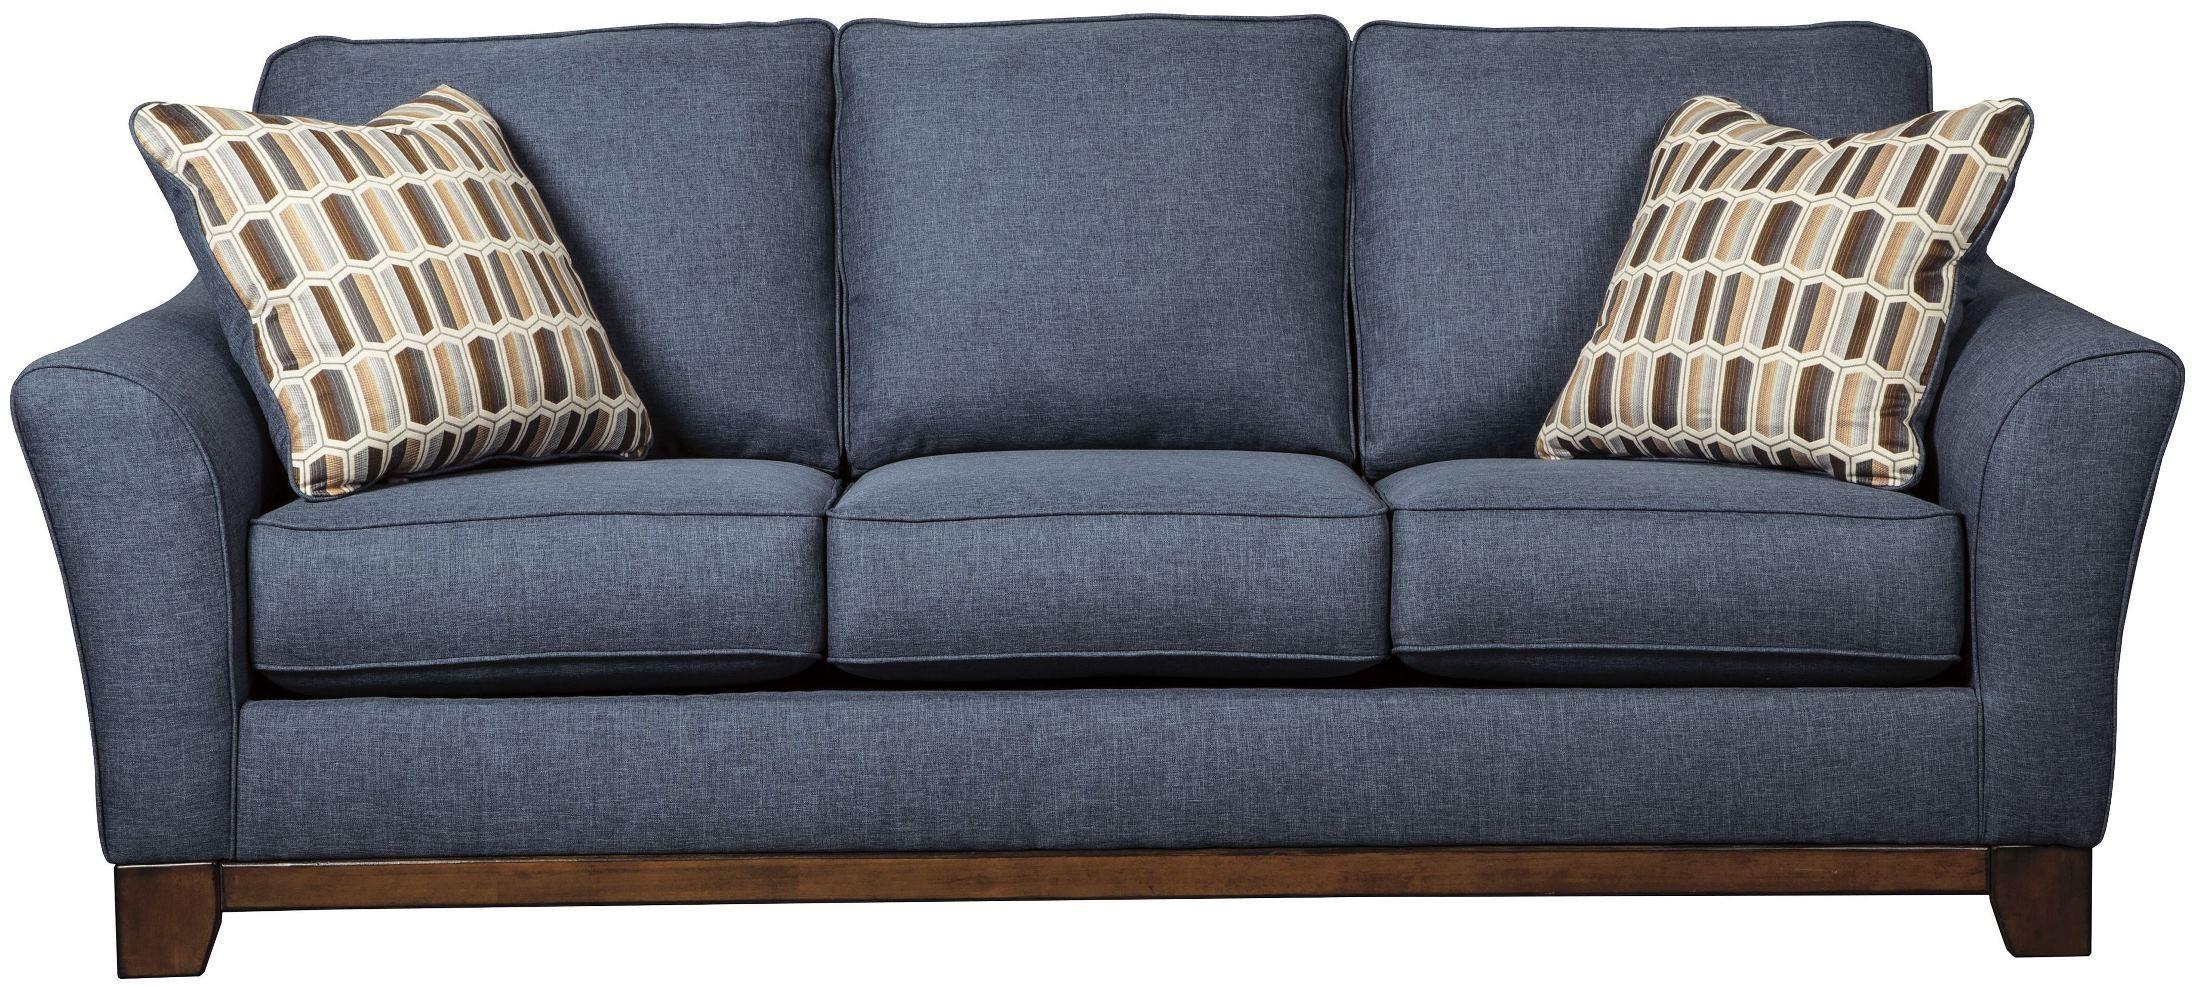 Janley Denim Sofa From Ashley | Coleman Furniture inside Blue Denim Sofas